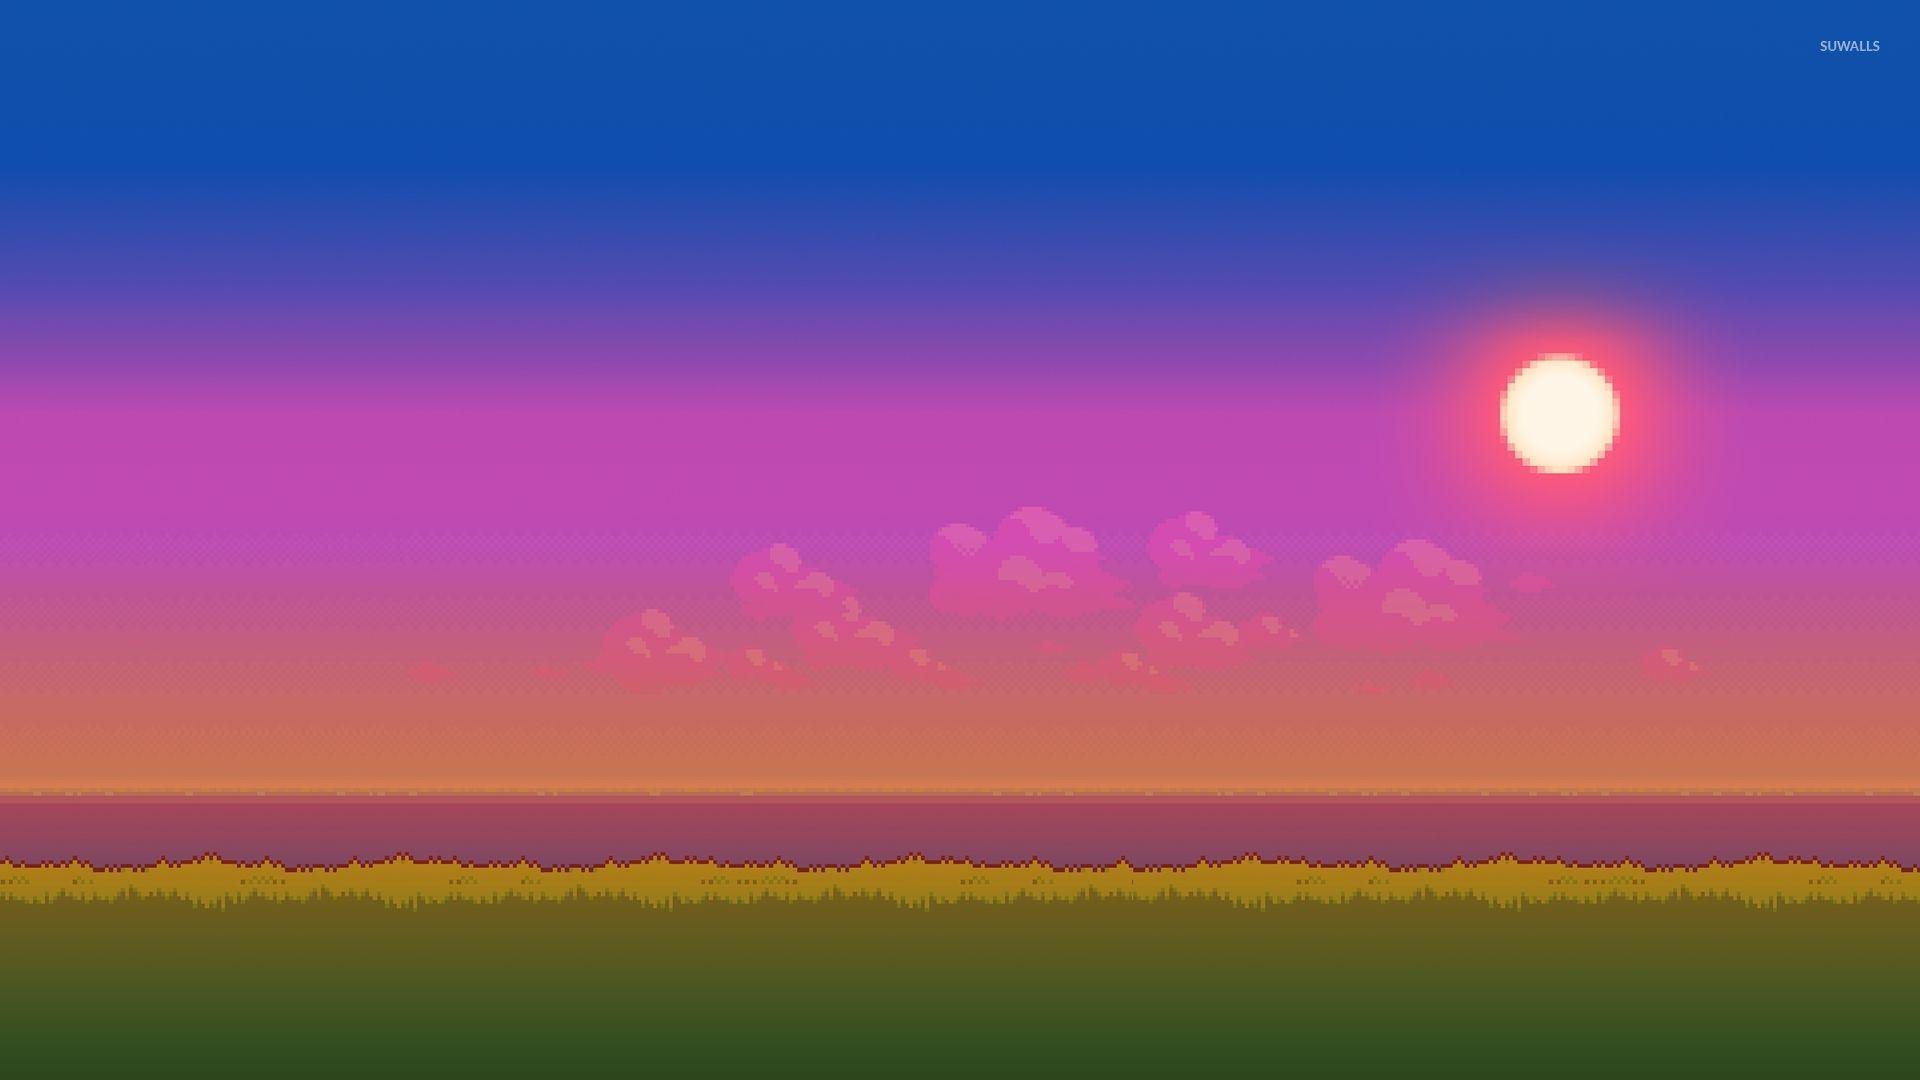 8-bit Wallpapers - Wallpaper Cave